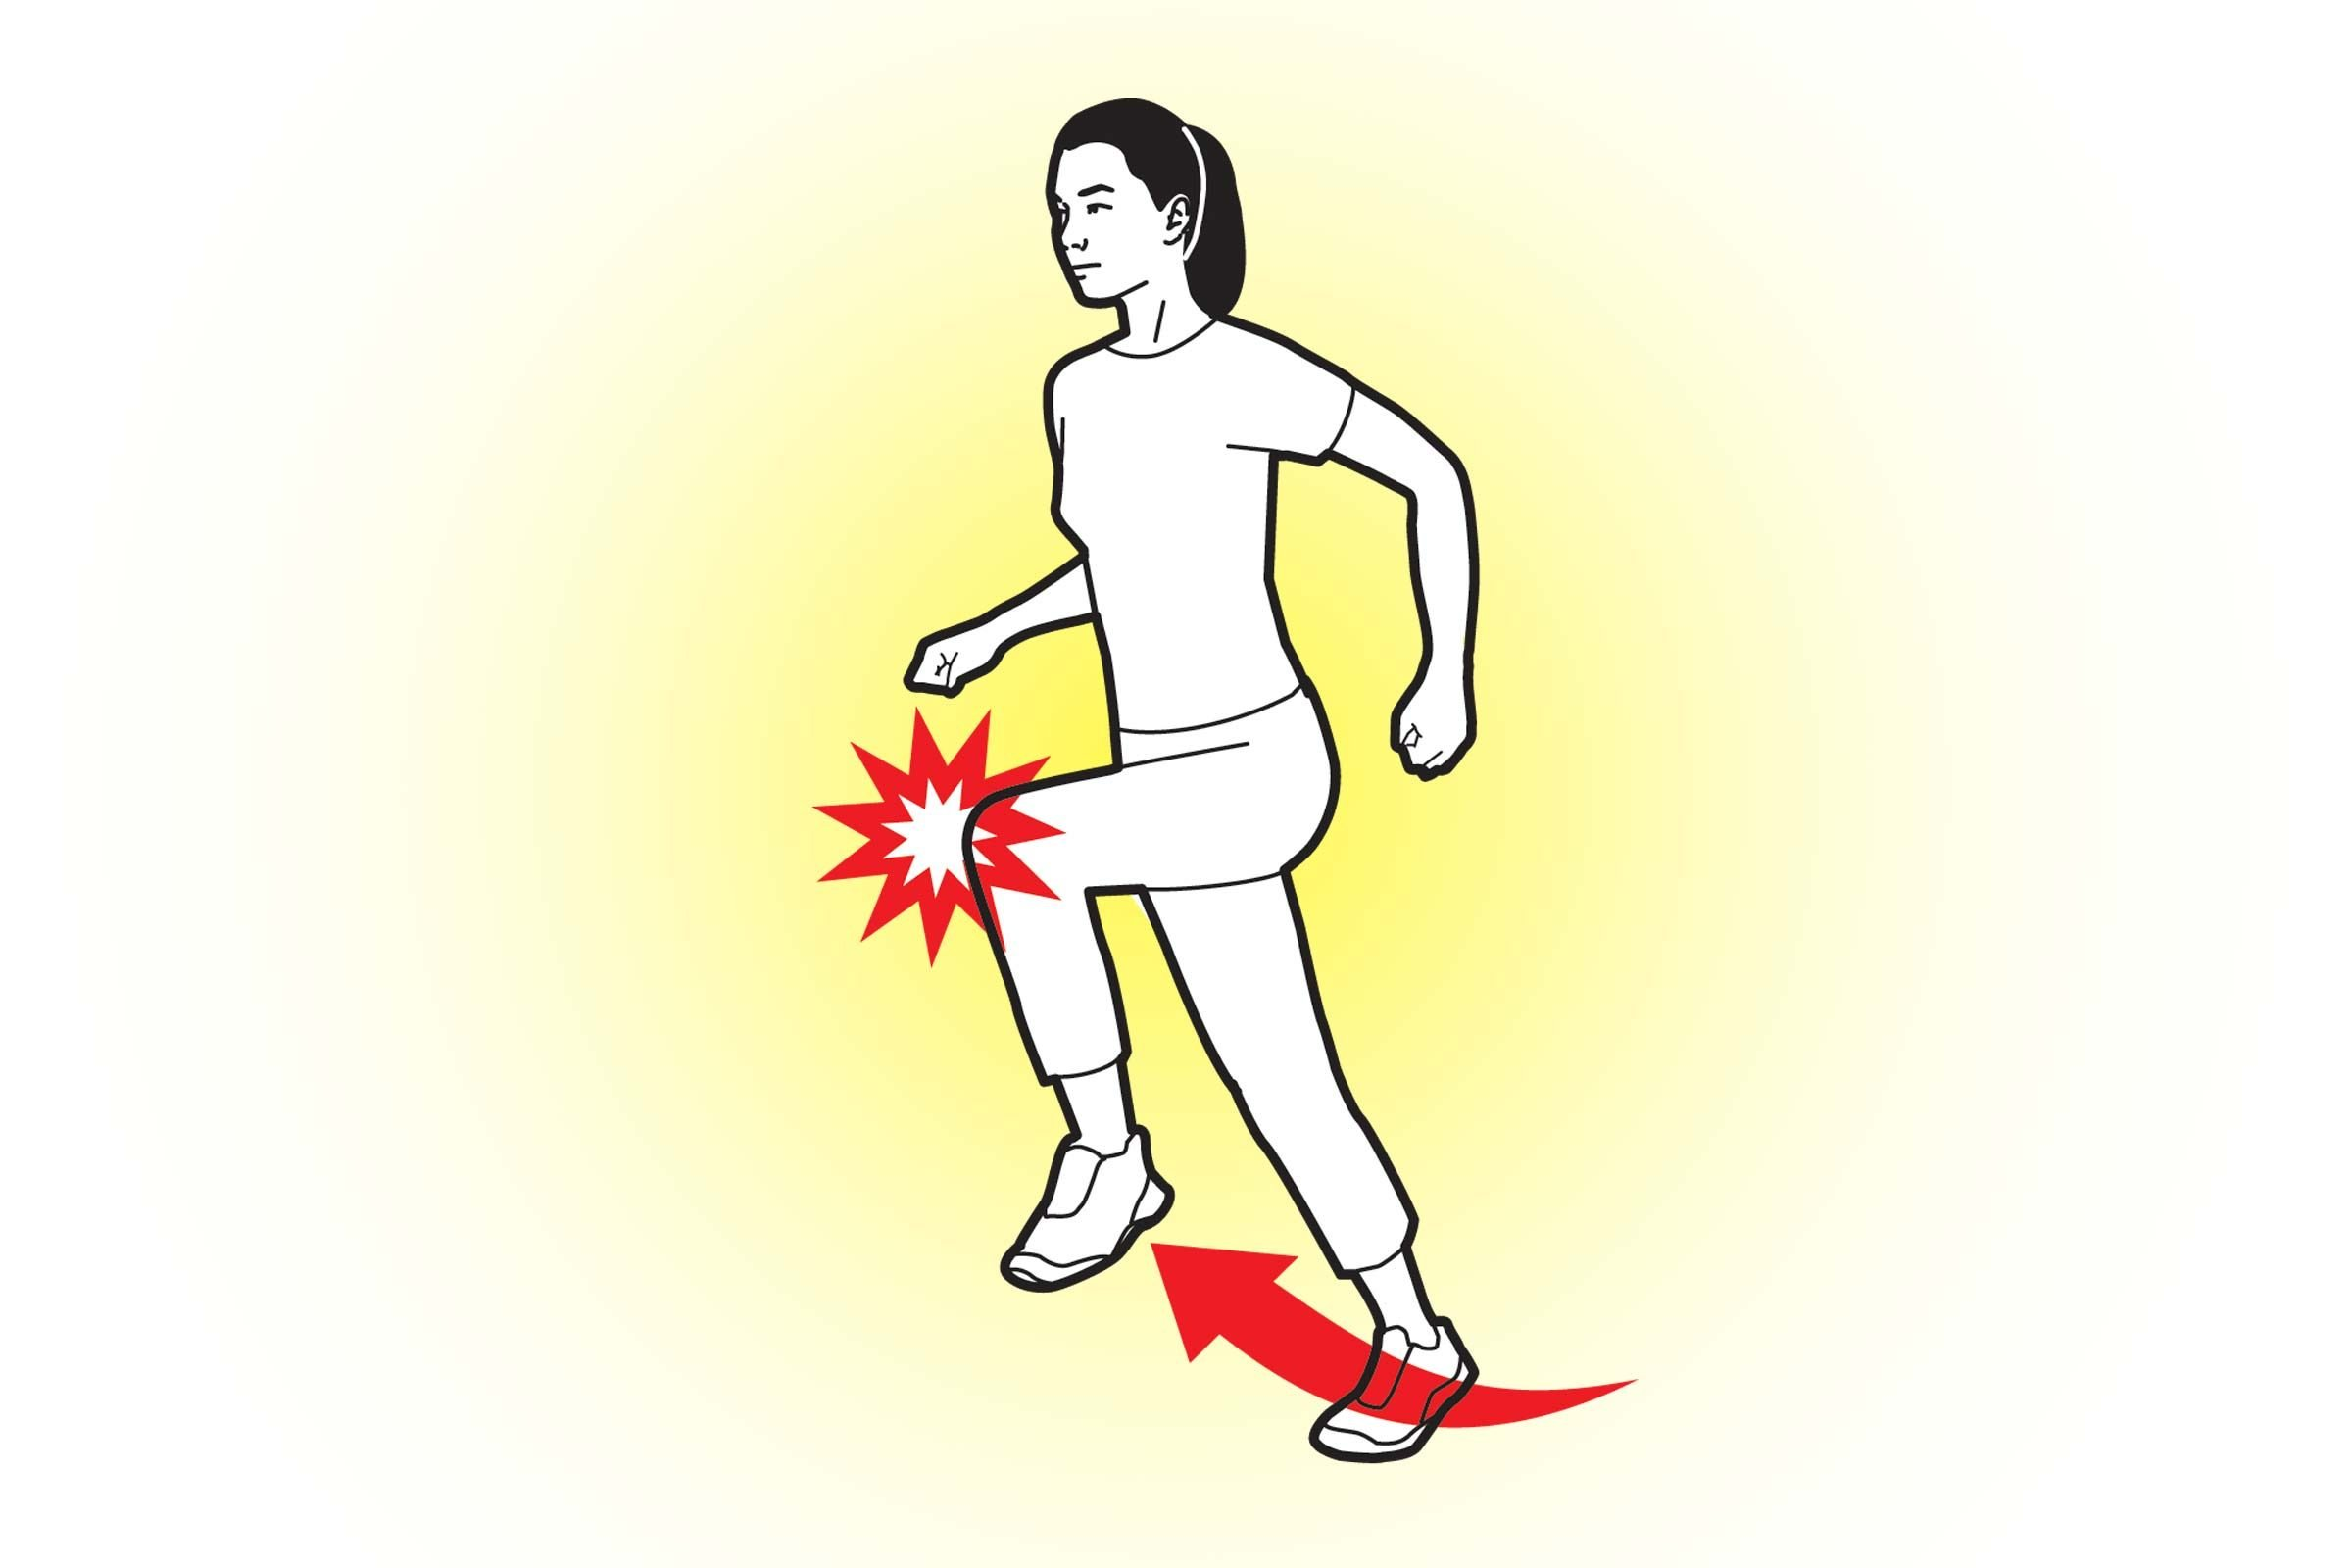 The stair-climb groin kick